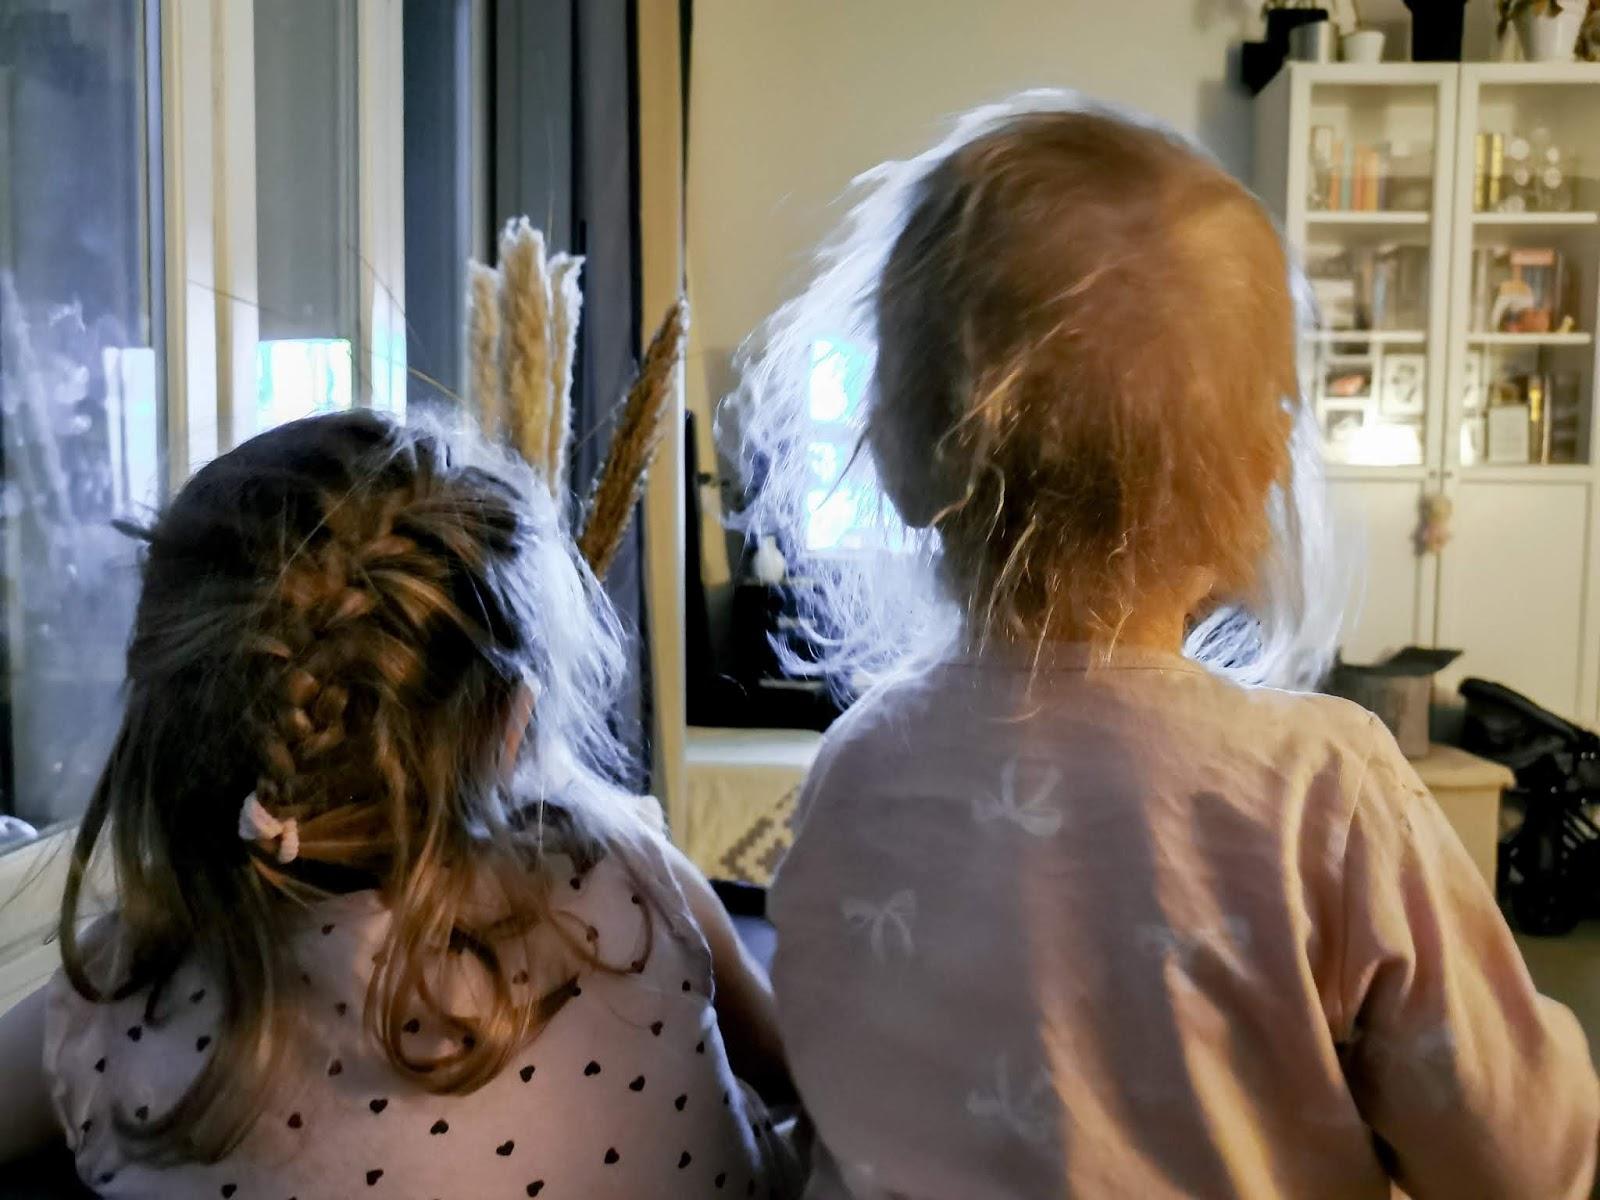 Big mamas home by Jenni S. Viikkokatsaus: Ihan vain perus arkea